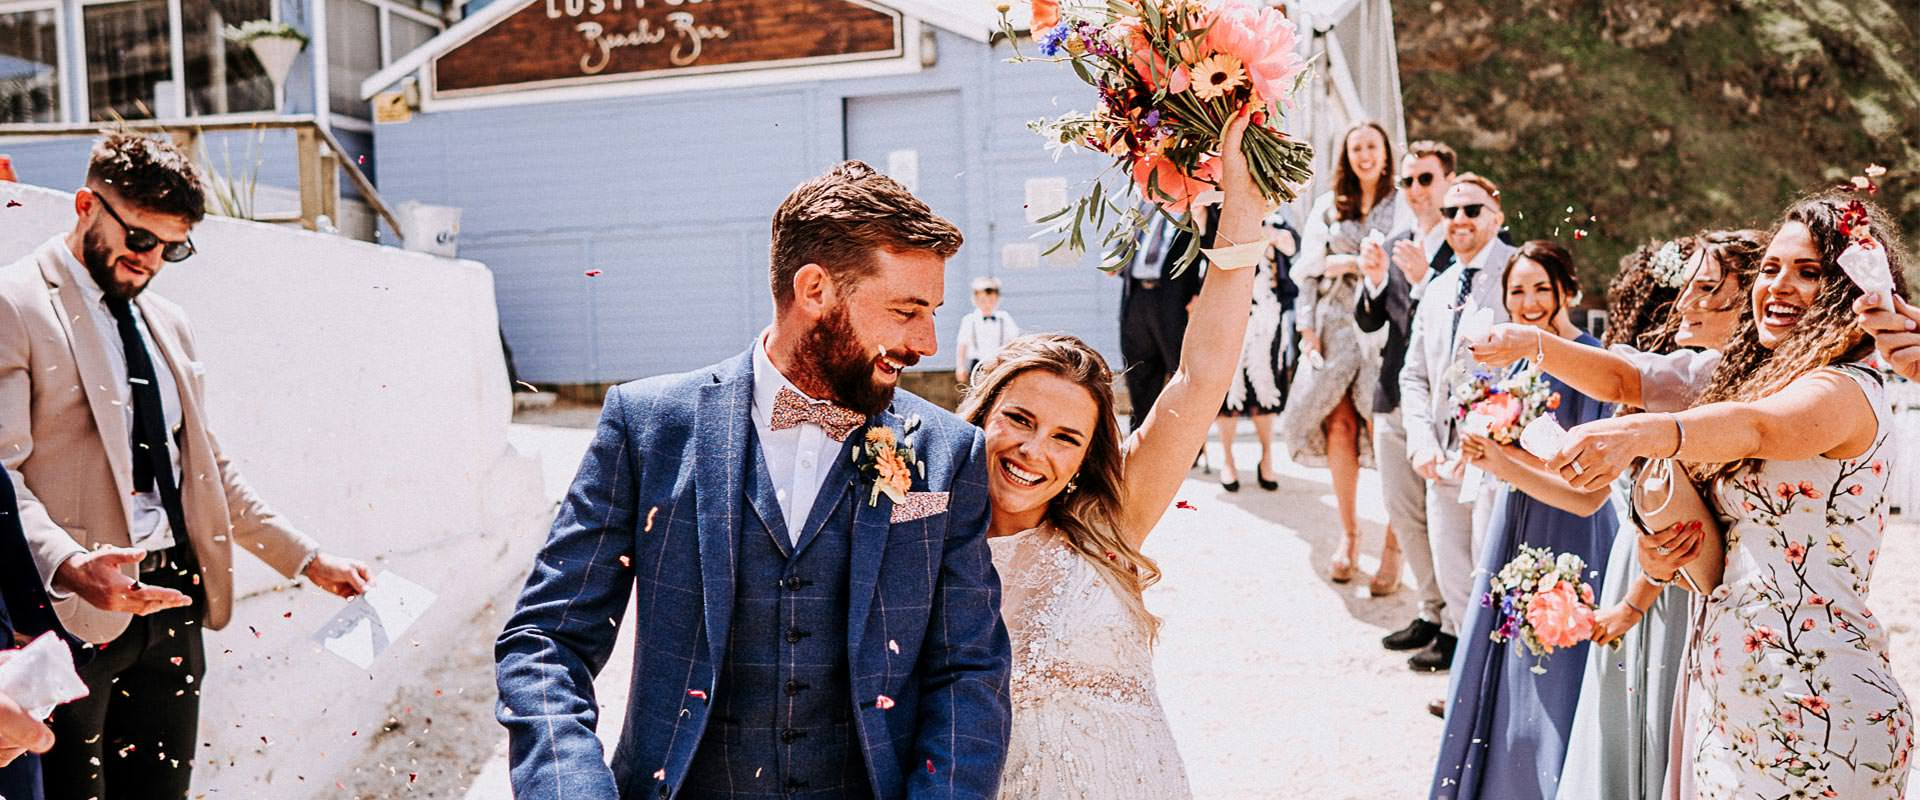 LUSTY GLAZE WEDDING PHOTOGRAPHER PRAISE